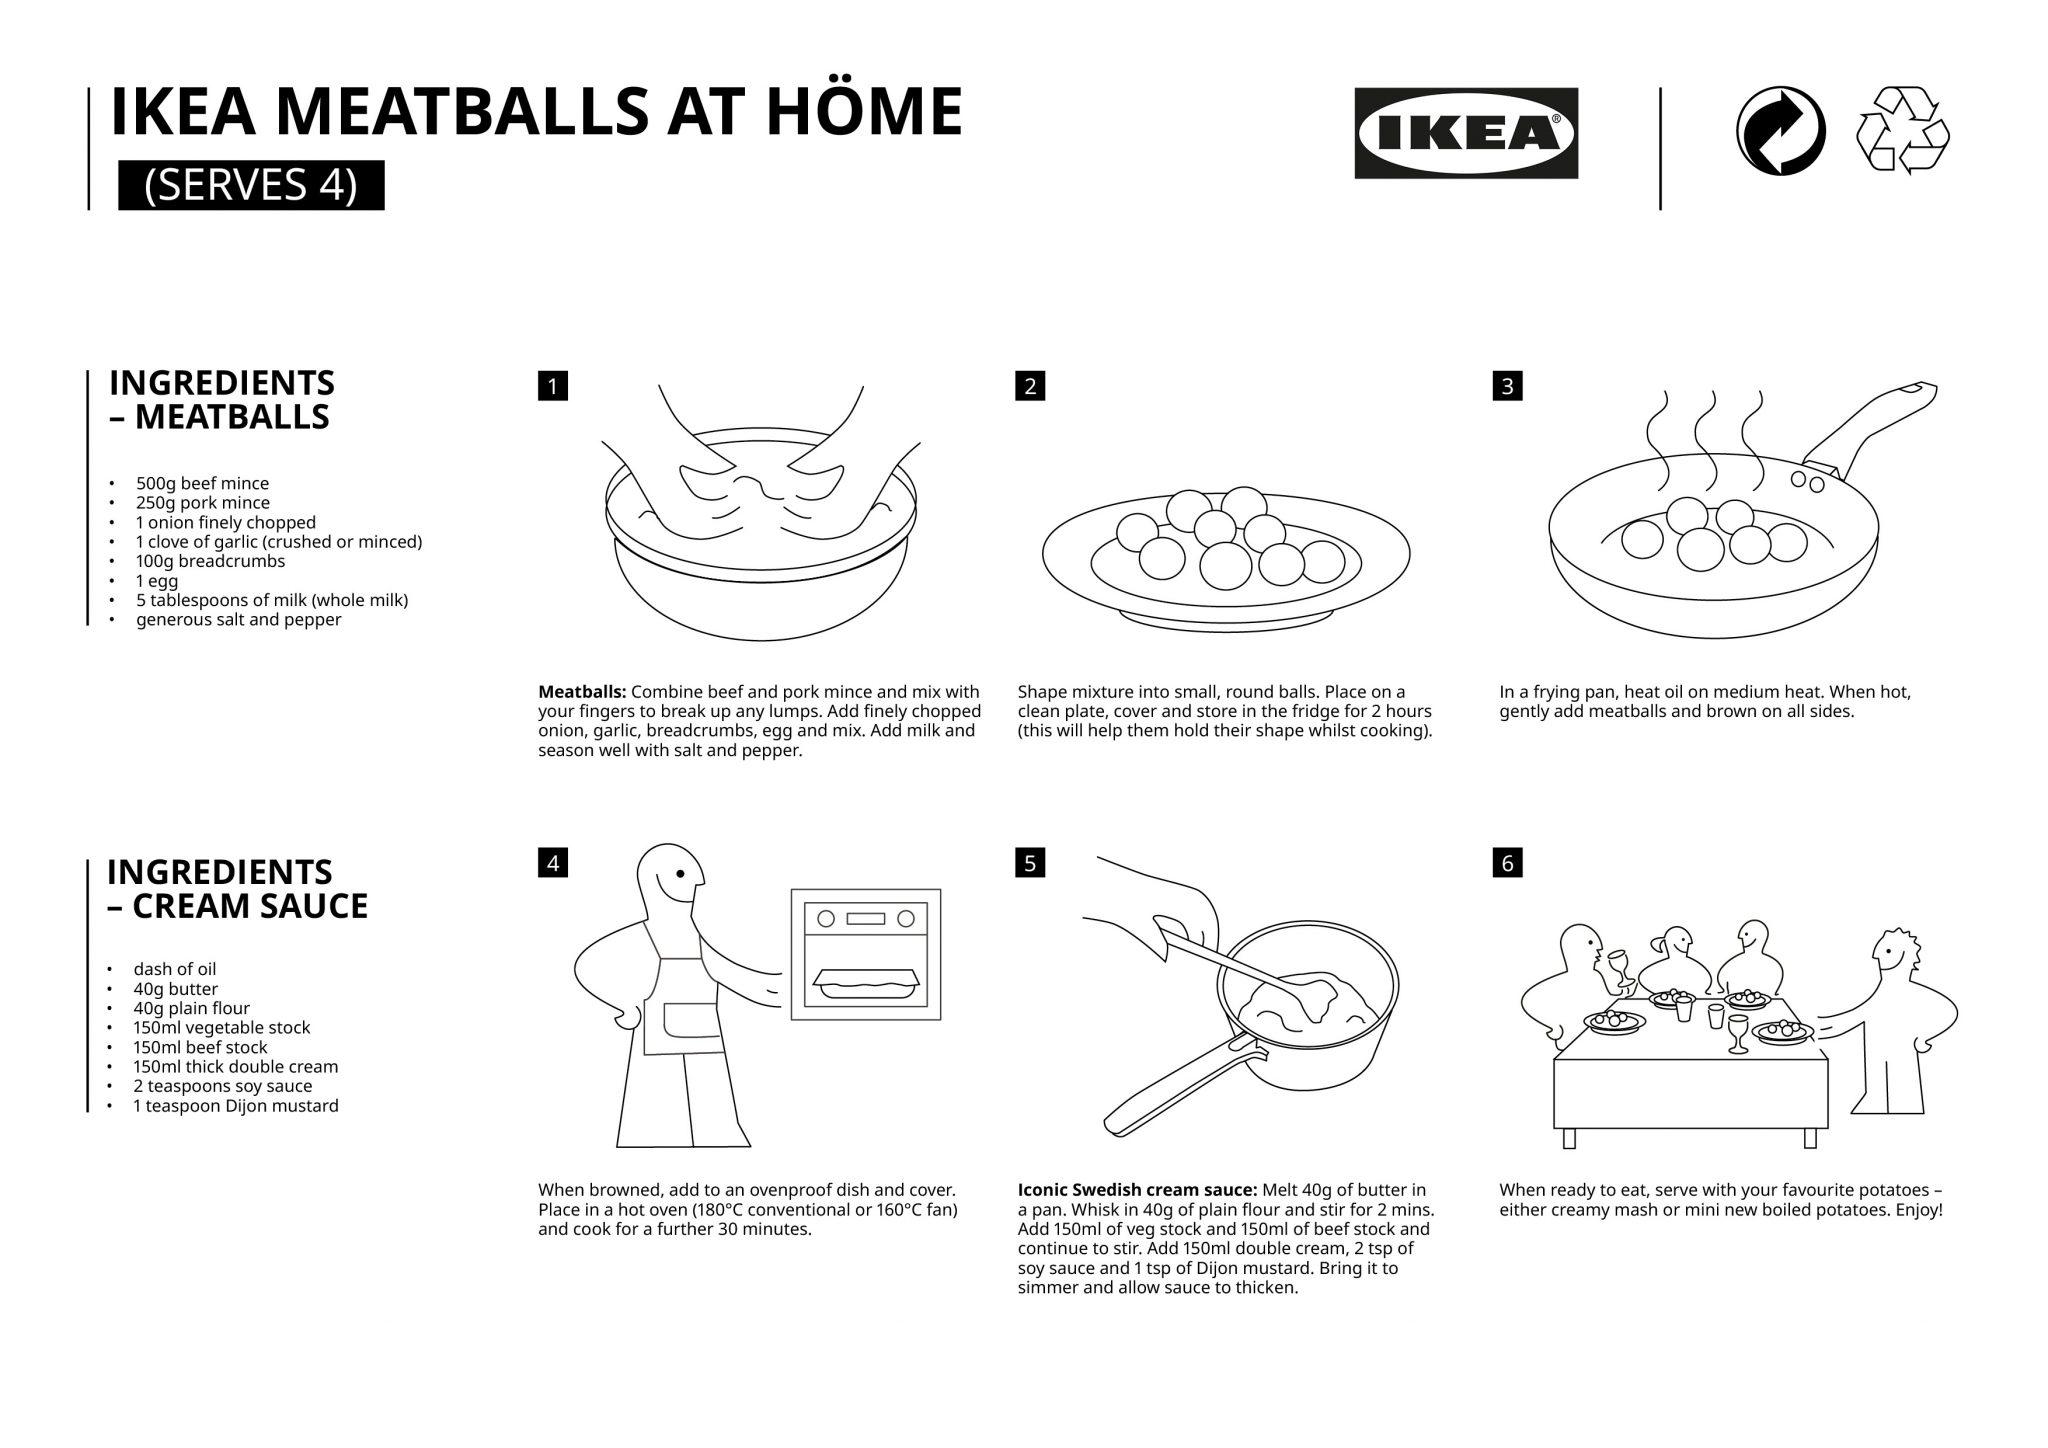 Ikea Releases Famous Meatballs Recipe